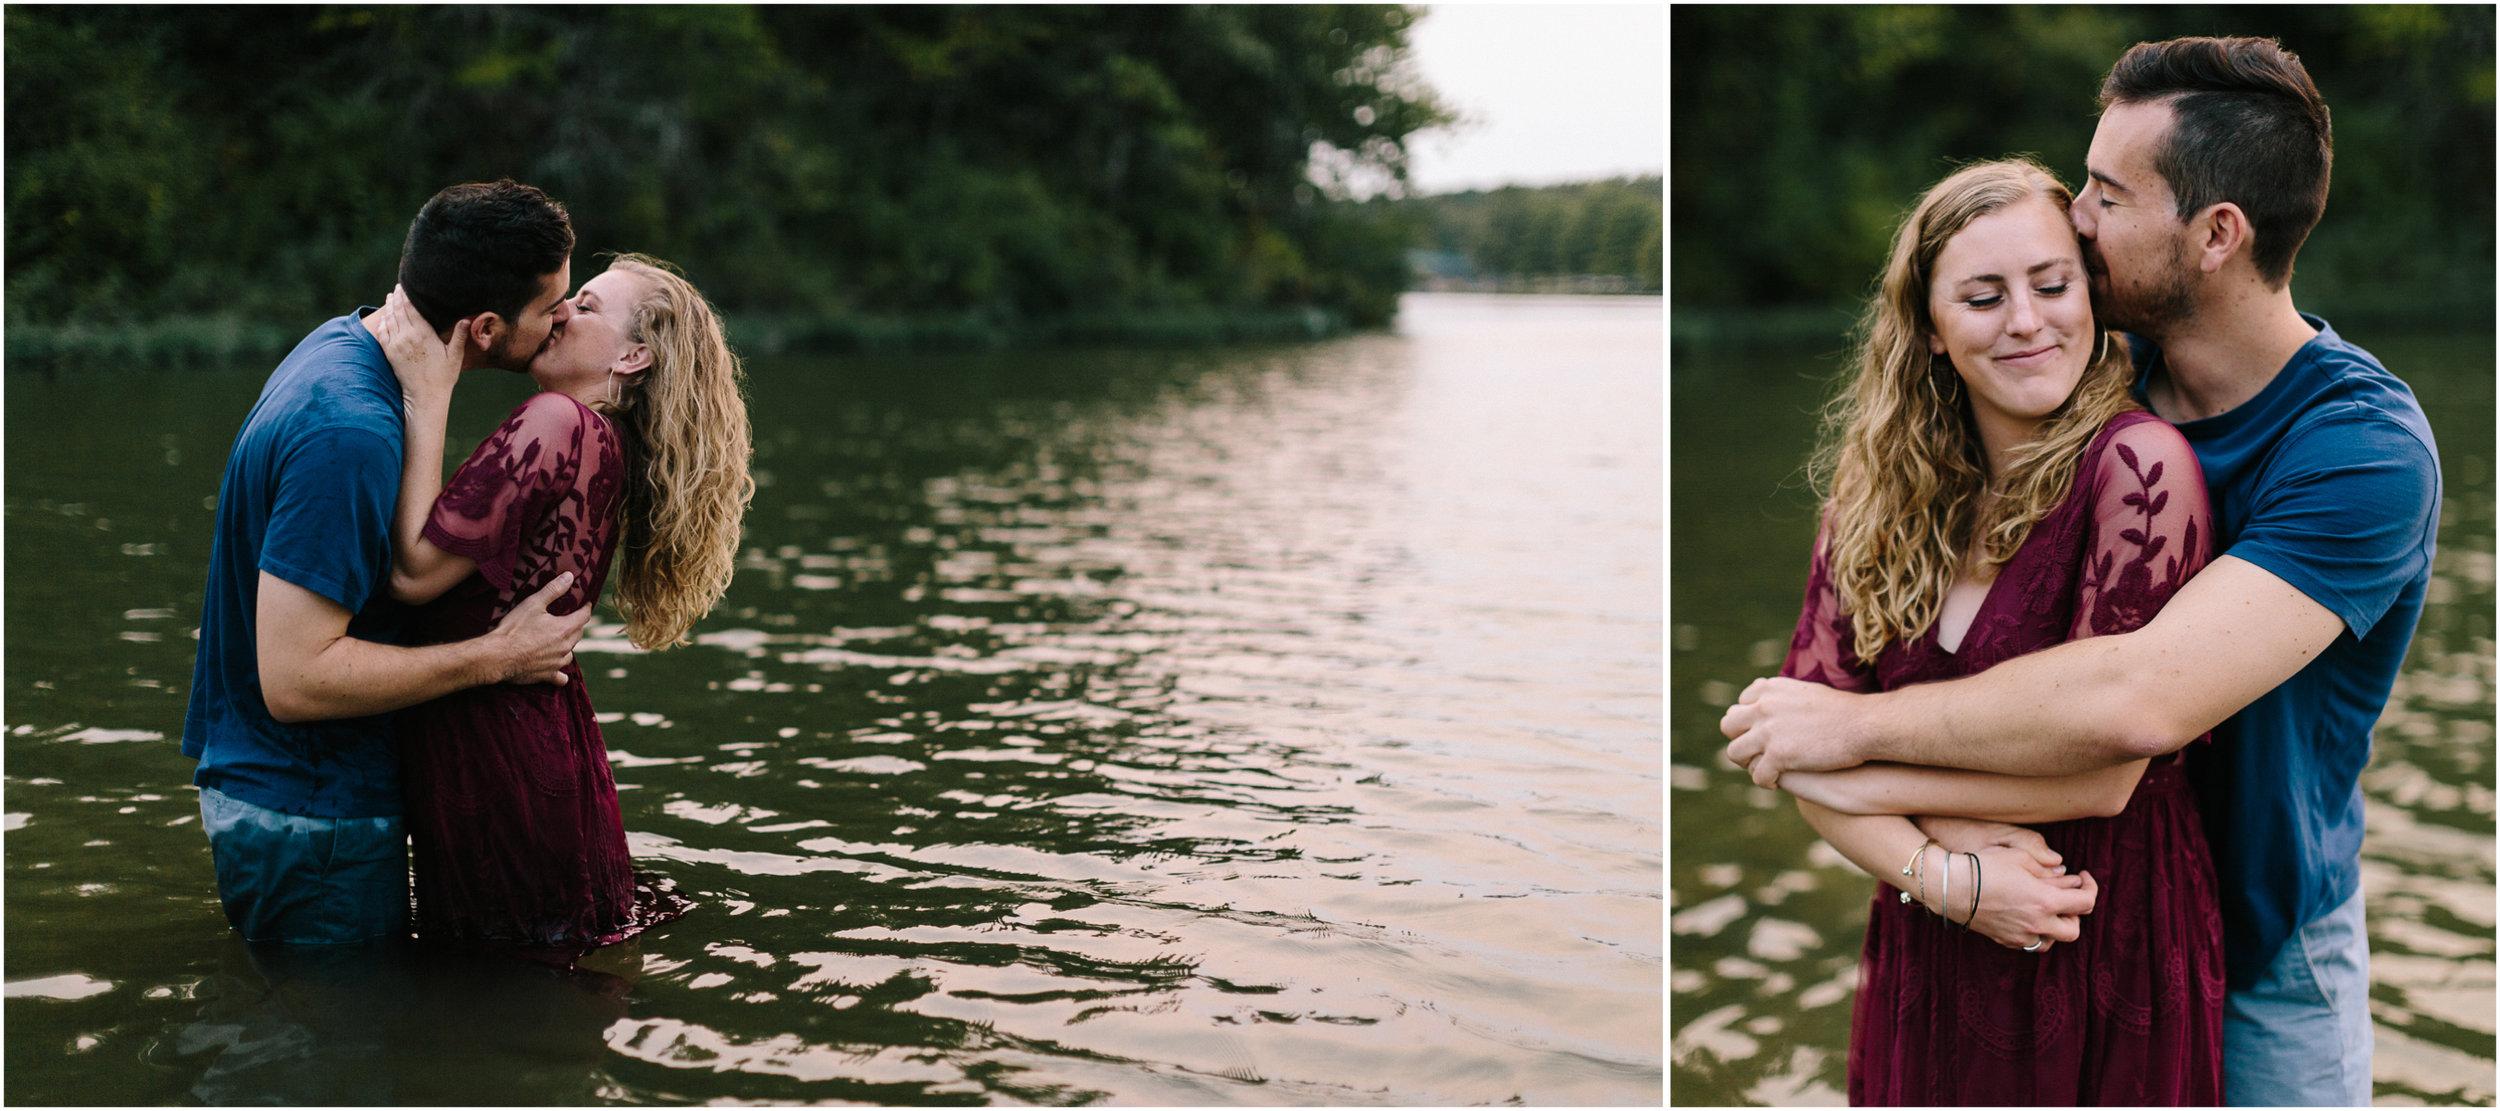 alyssa barletter photography shawnee mission lake photos-16.jpg